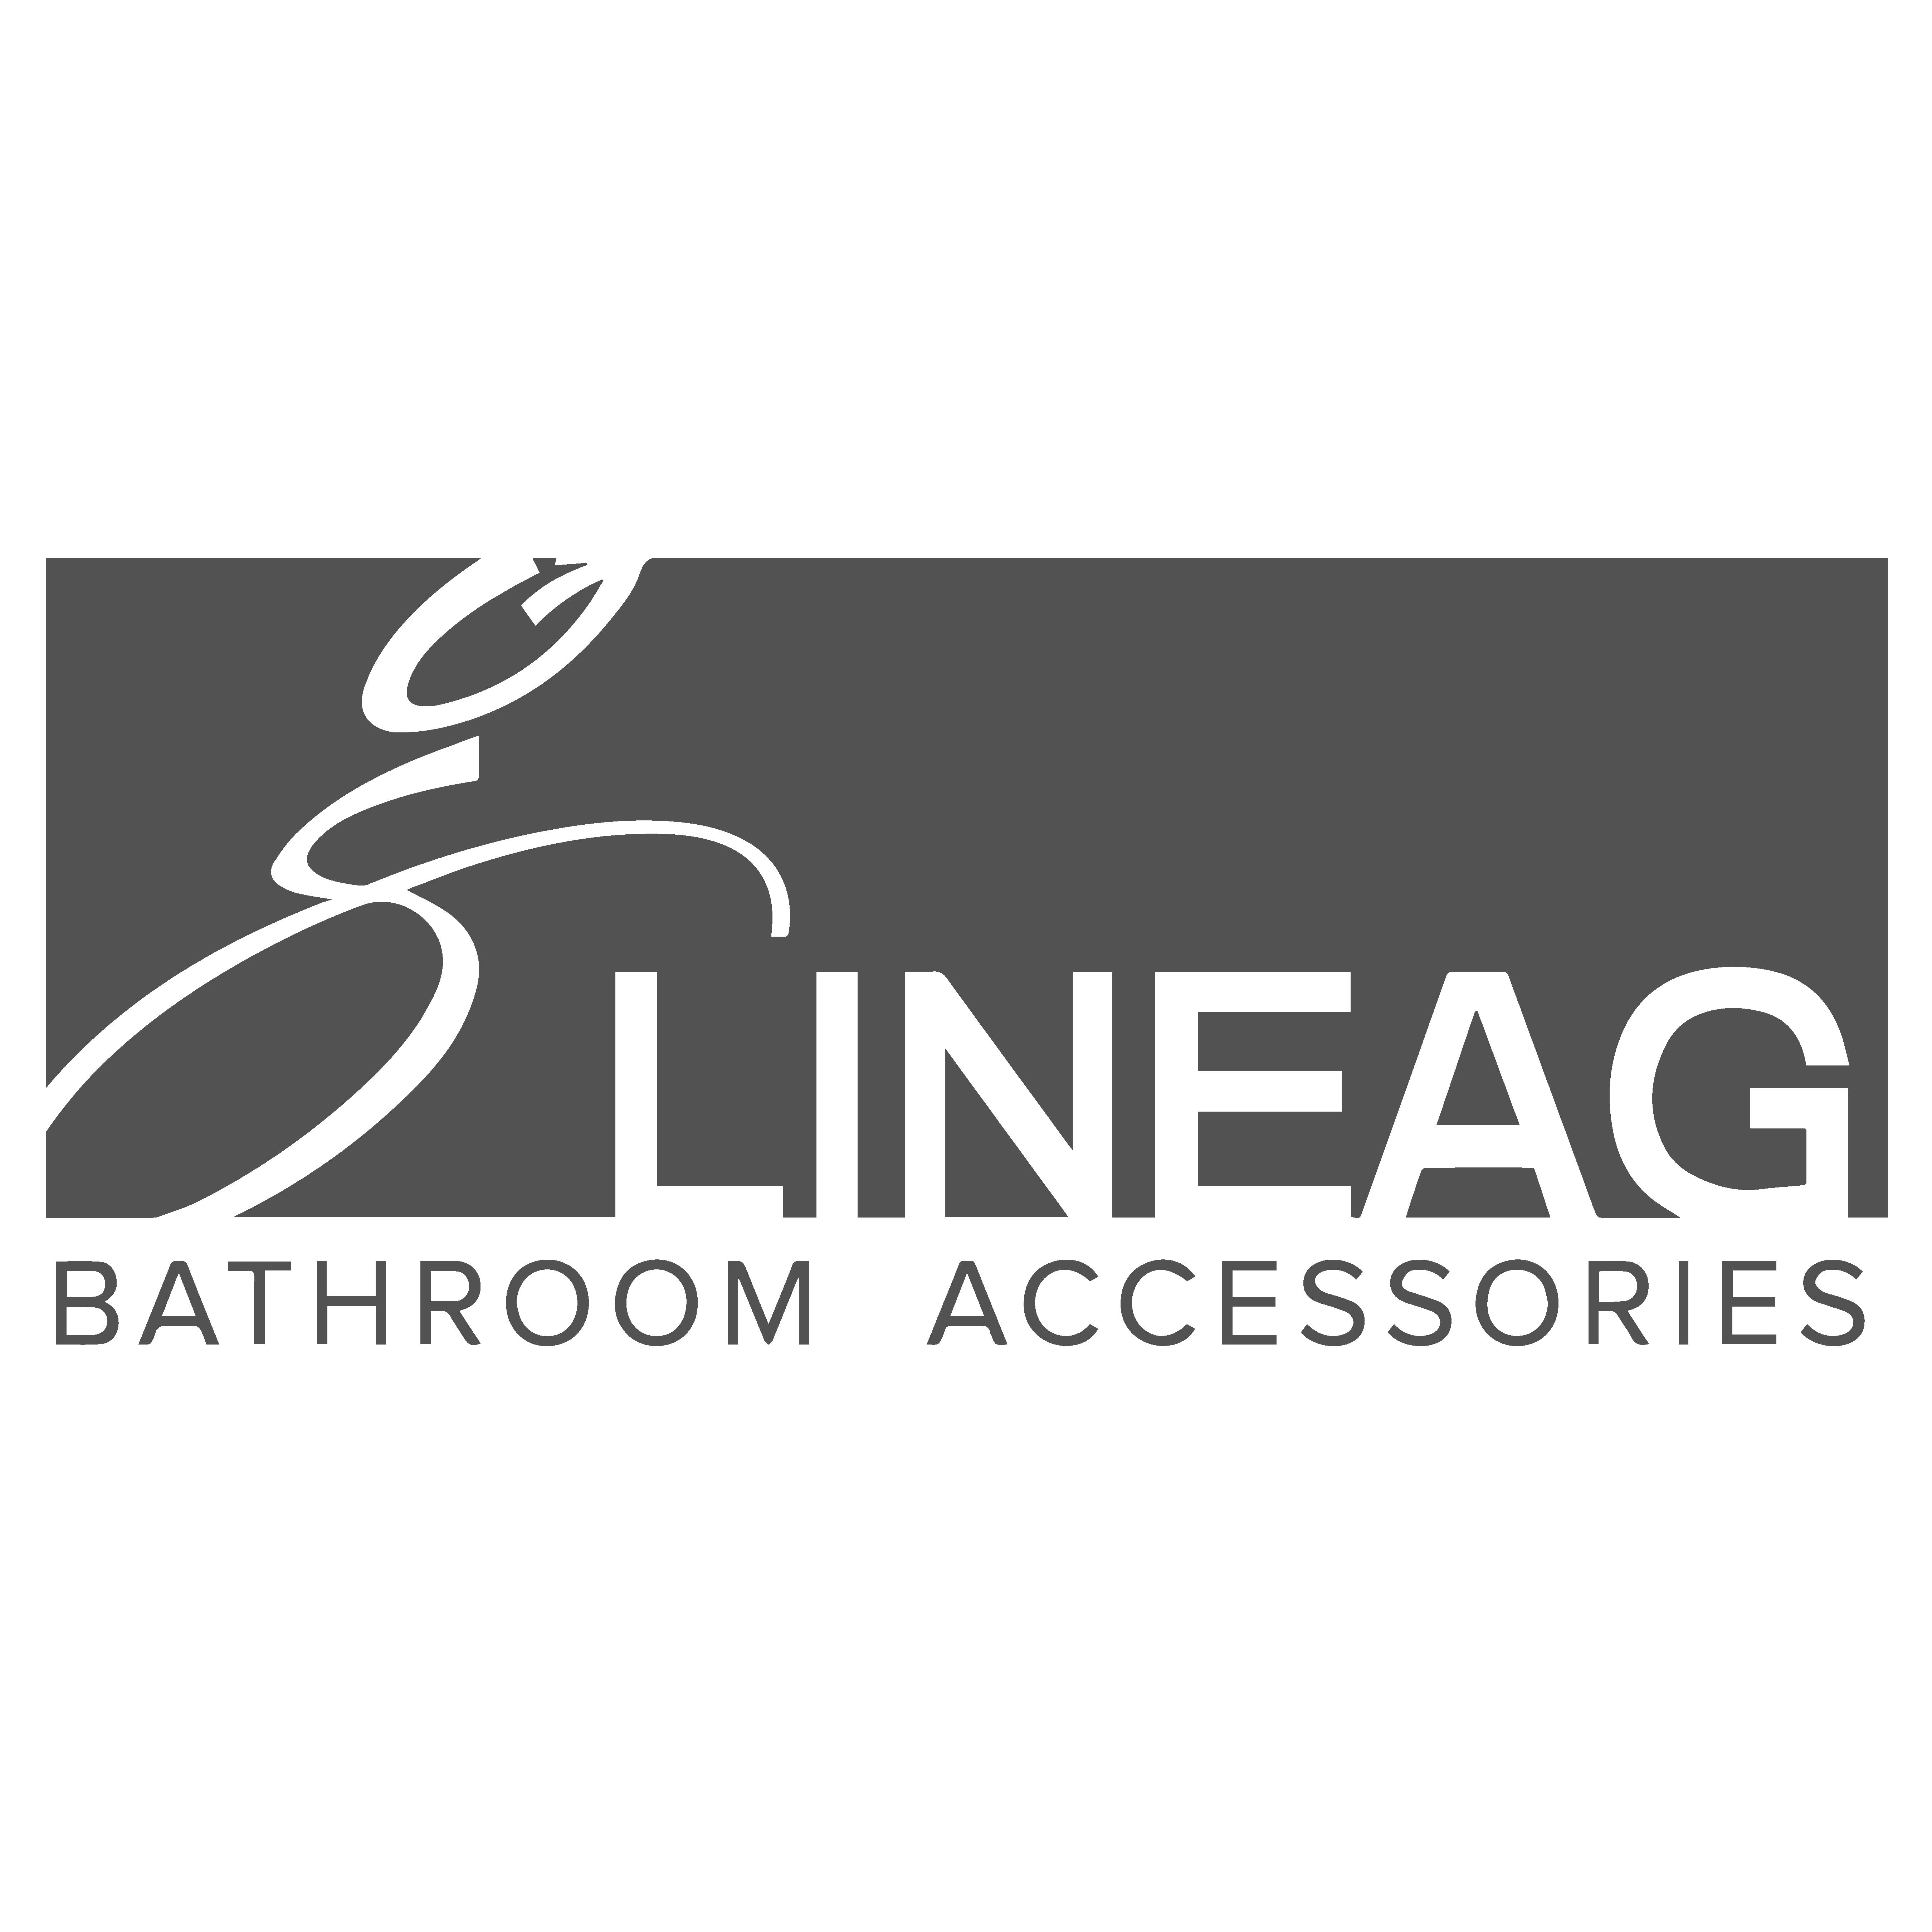 lineag-logo